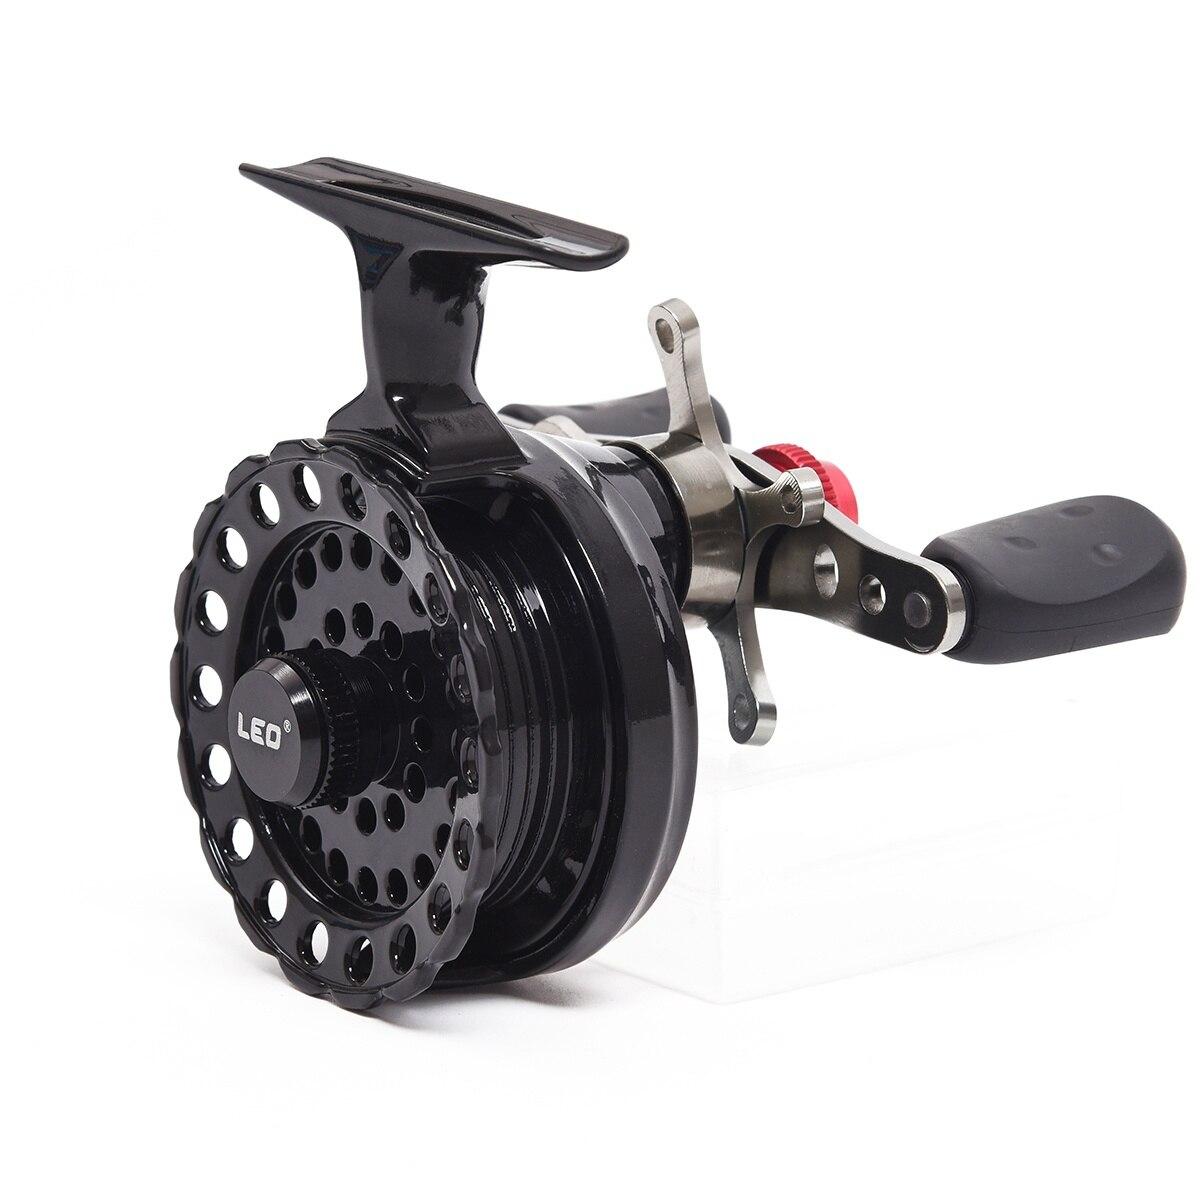 MMFC-LEO DWS60 4 + 1BB 2,6: 1 65mm Fly Fishing Reel Rad mit Hoher Fuß Angeln Reels Angeln Reel Räder